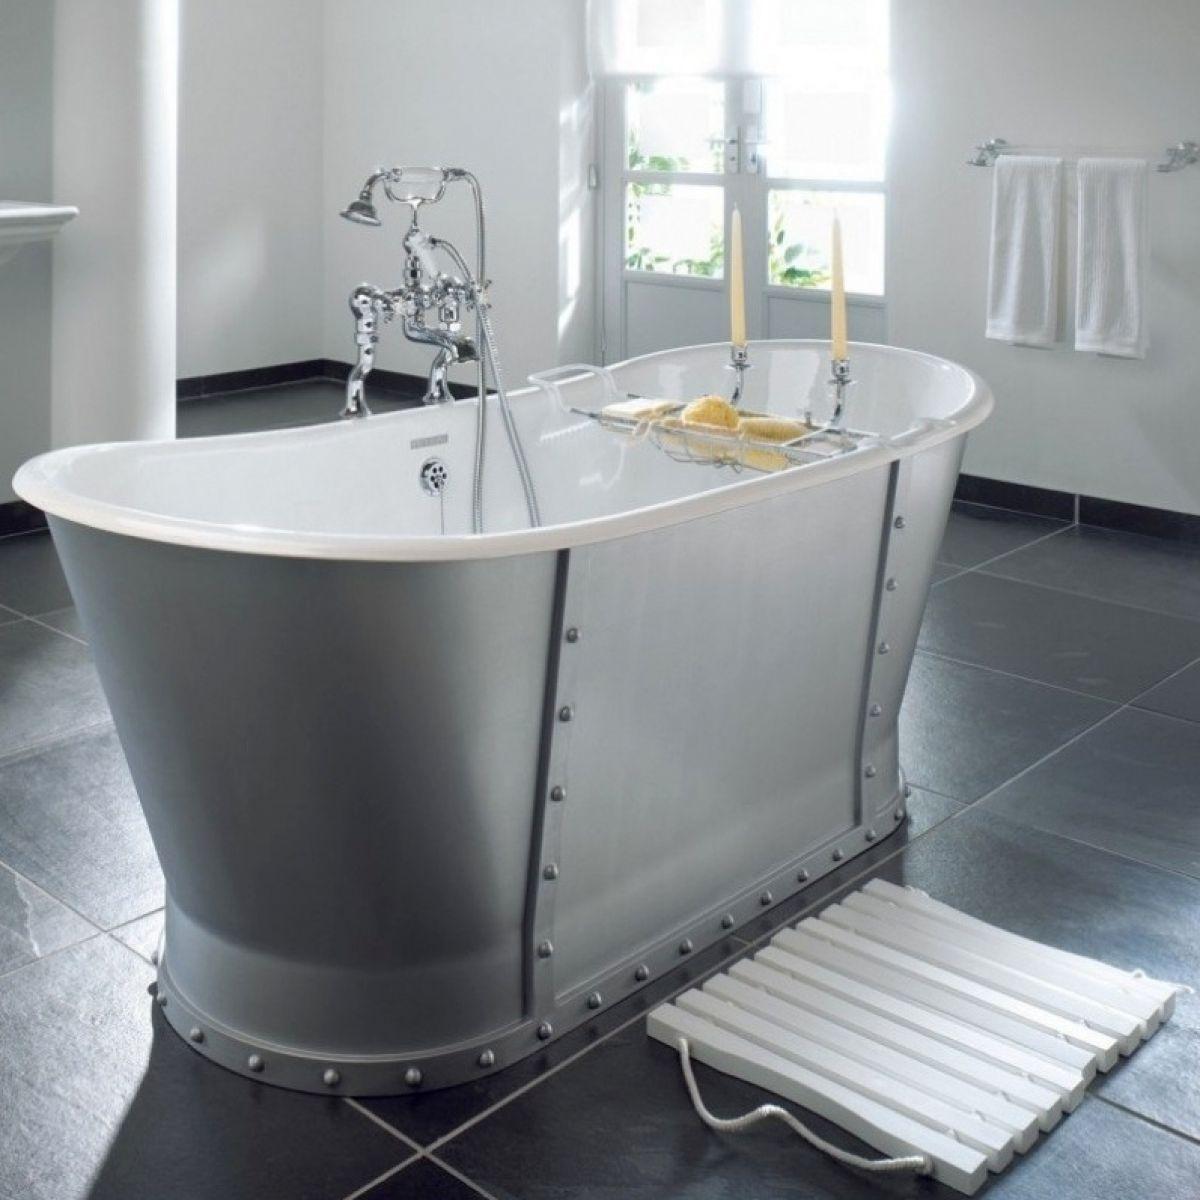 Imperial Baglioni Cast Iron Bath : UK Bathrooms